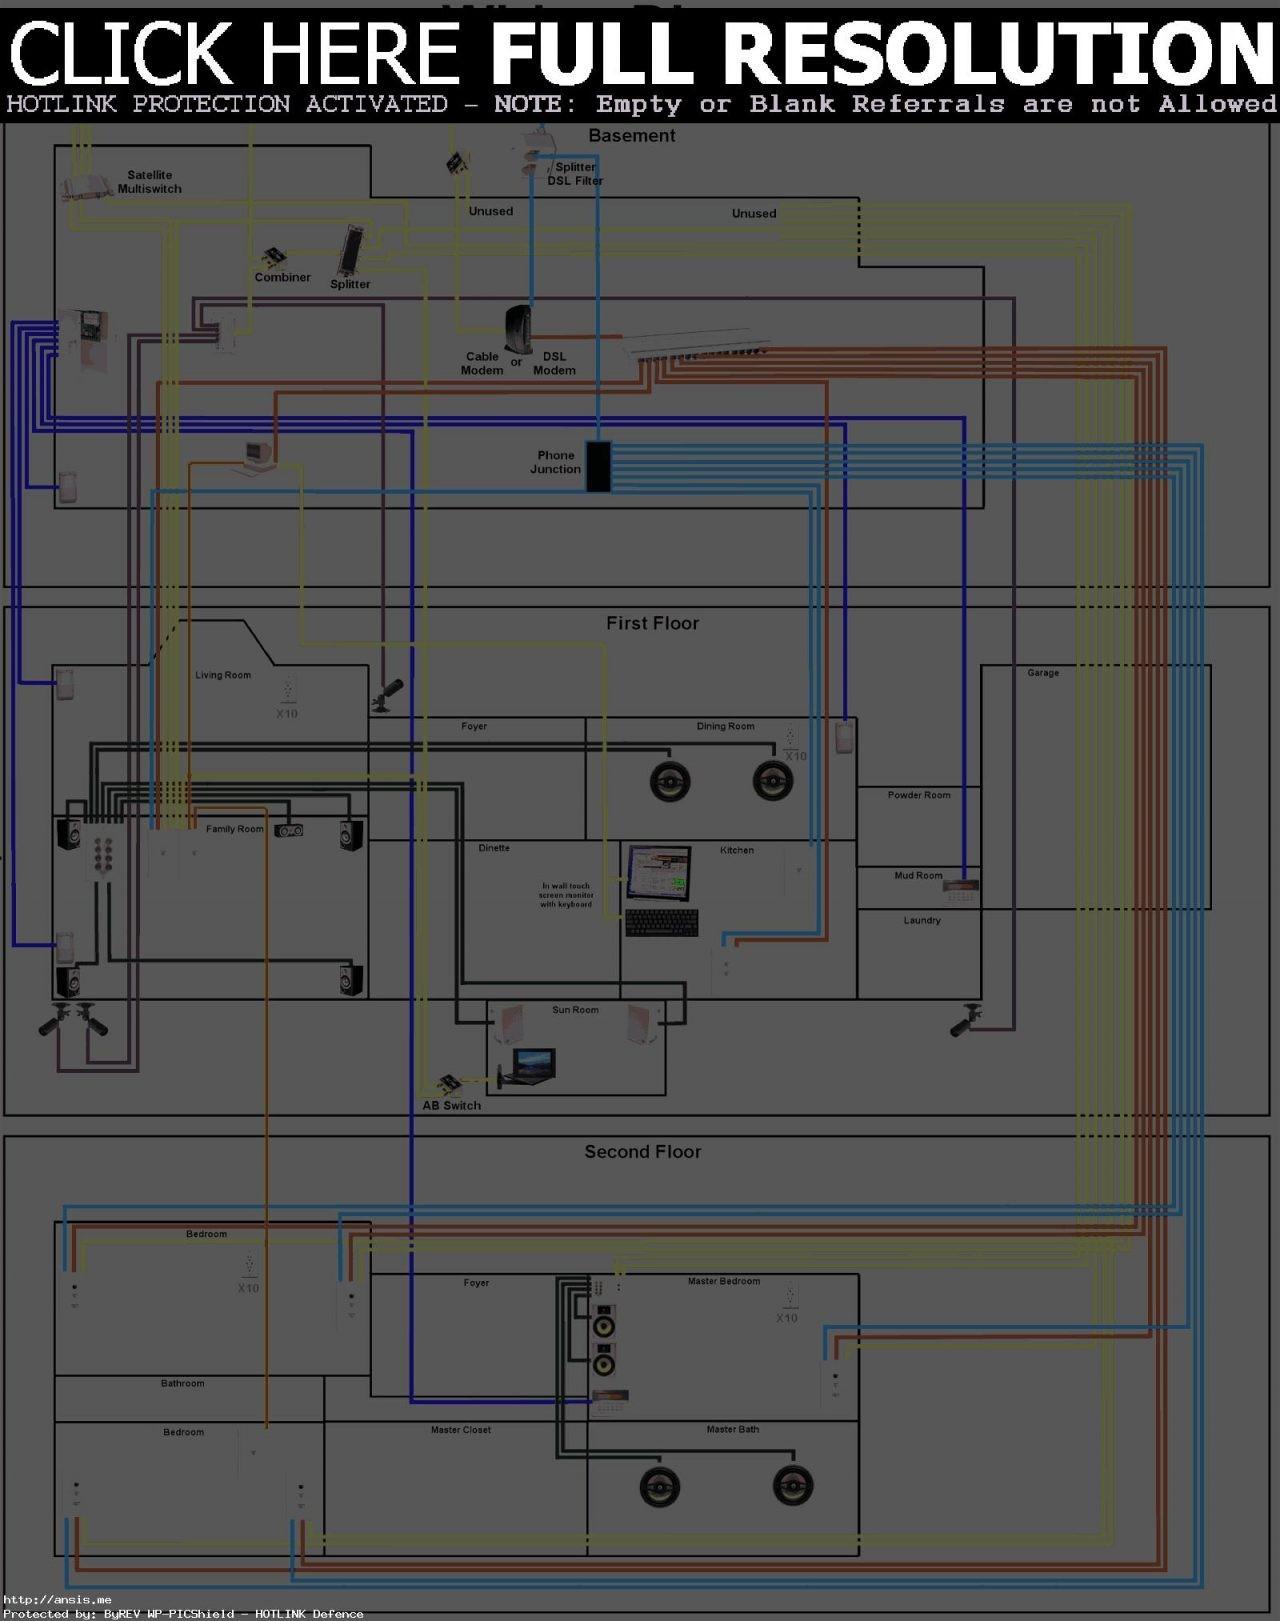 Adsl Wiring Diagram Australia Refrence Dsl Phone Jack Wiring Diagram